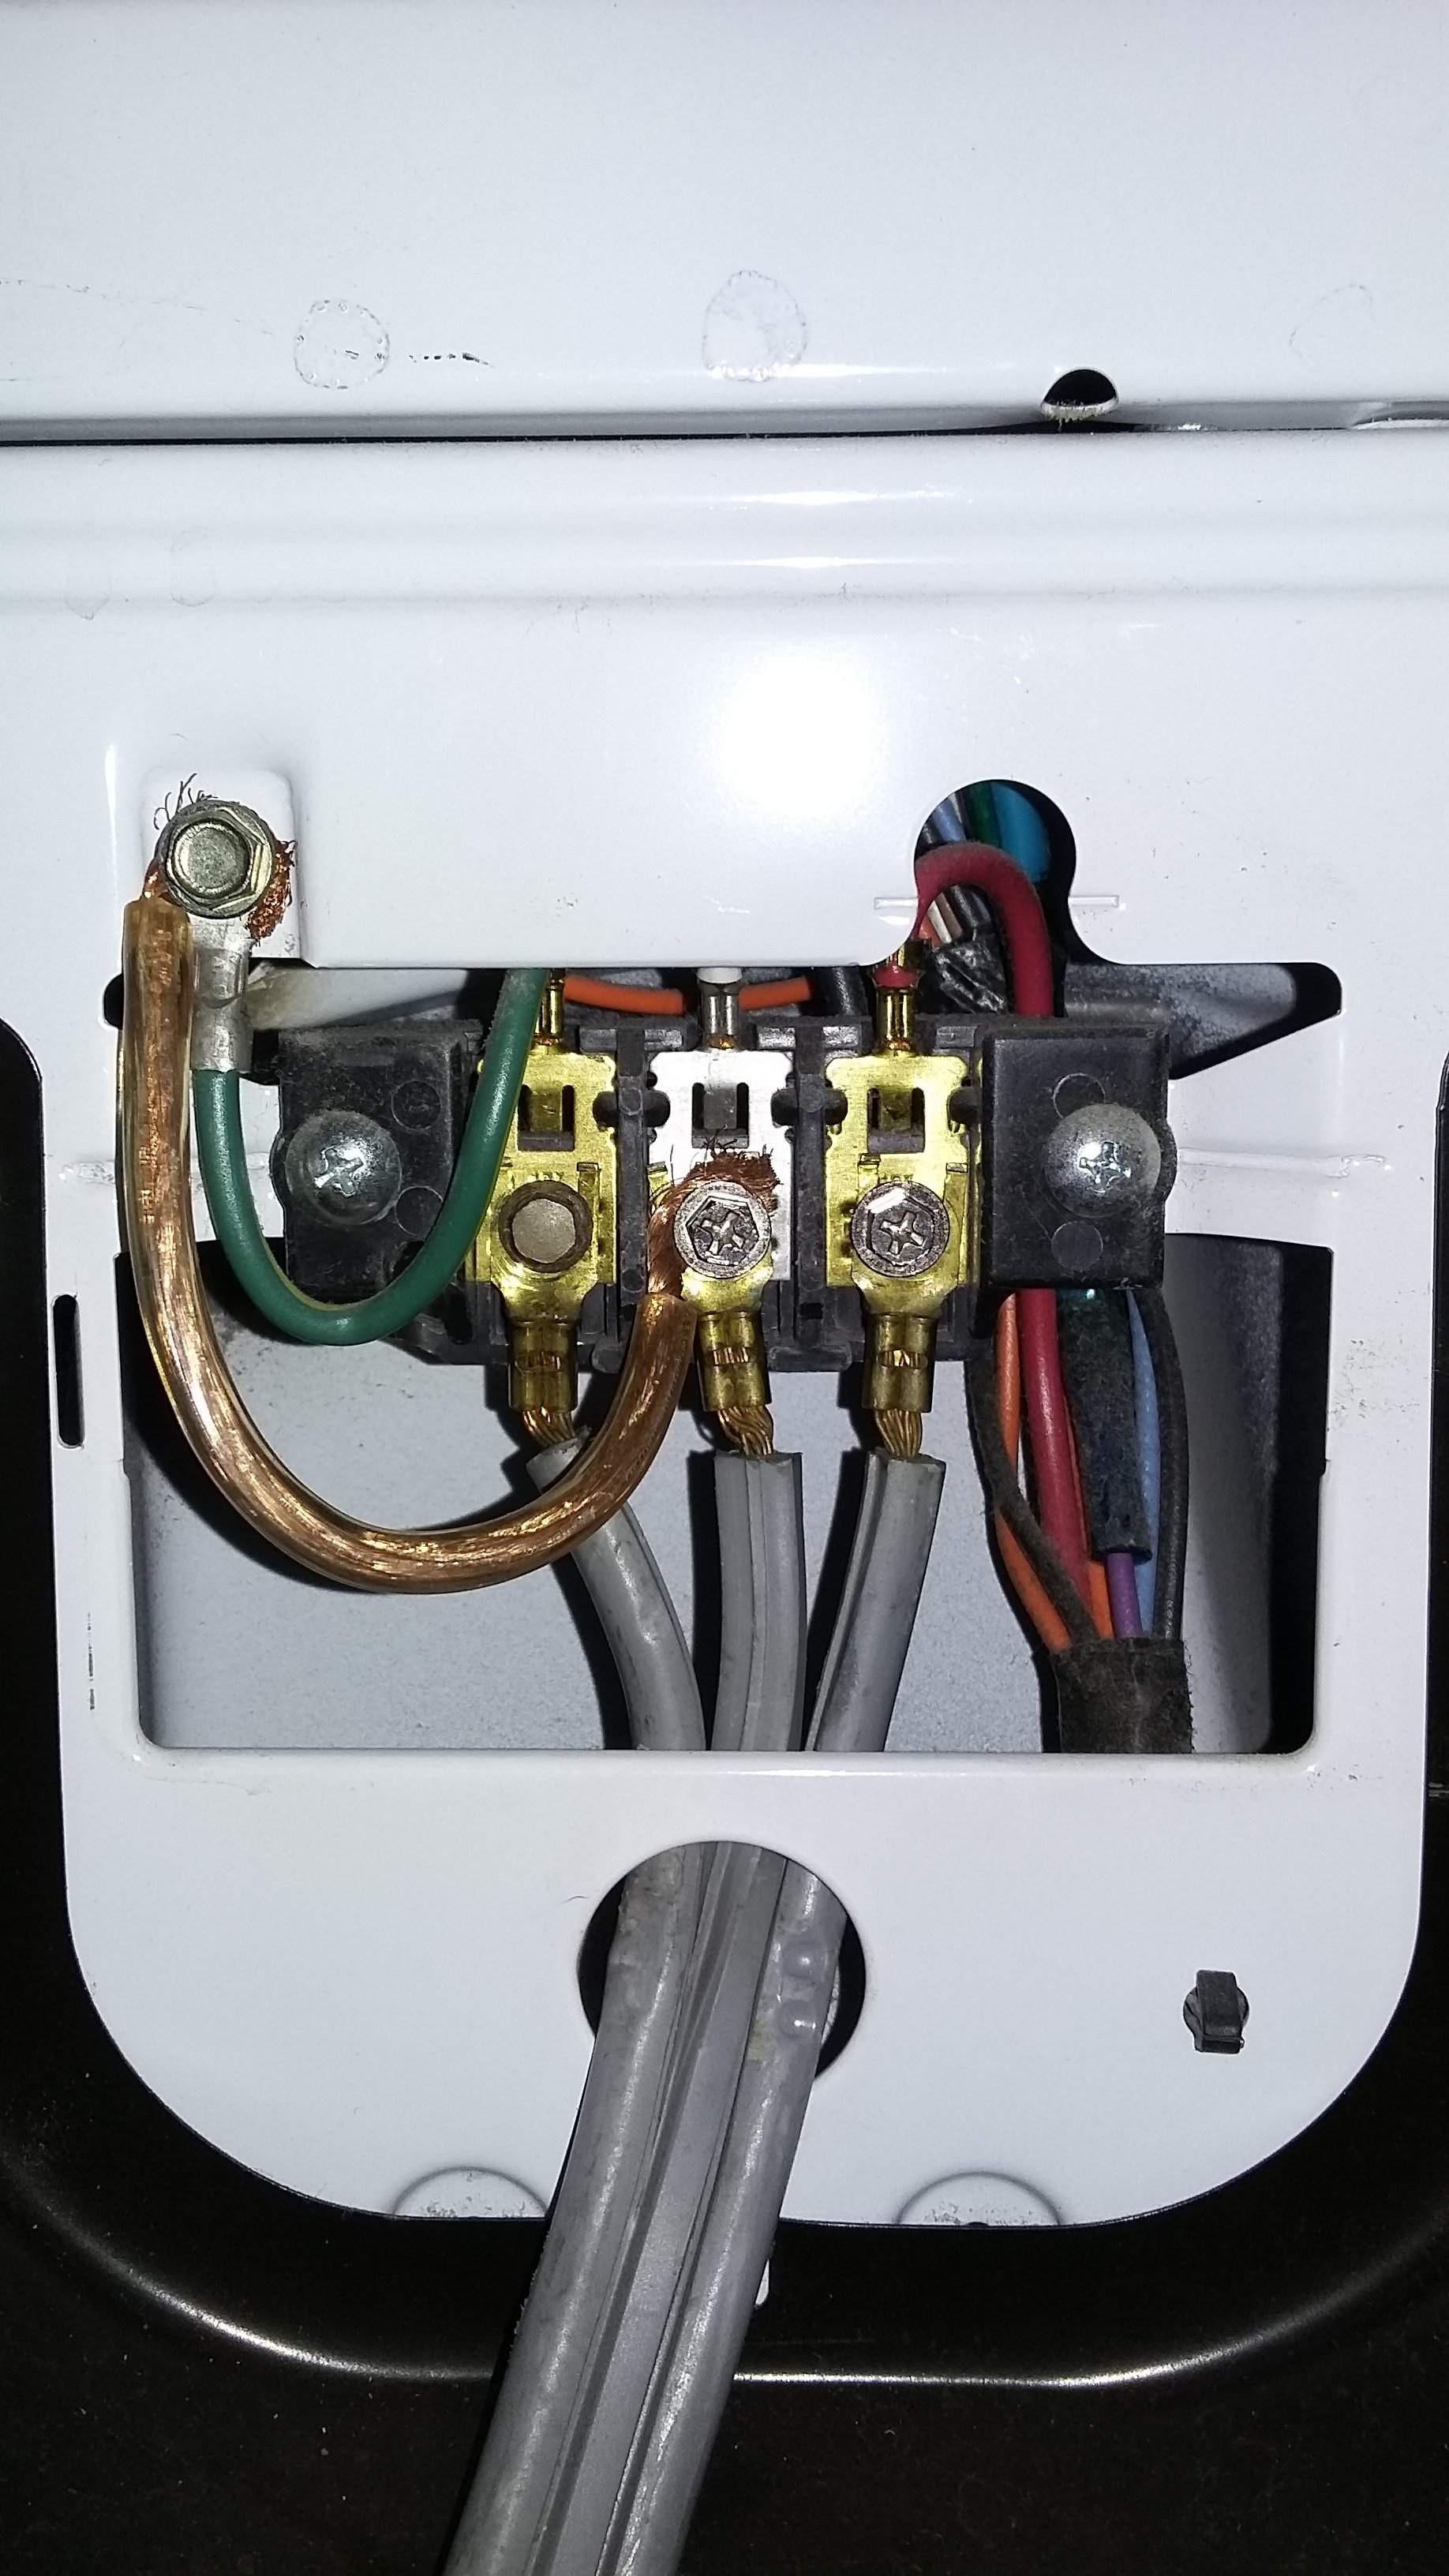 Dryer Plug Wiring Diagram 3 Prong | Releaseganji - Dryer Plug Wiring Diagram